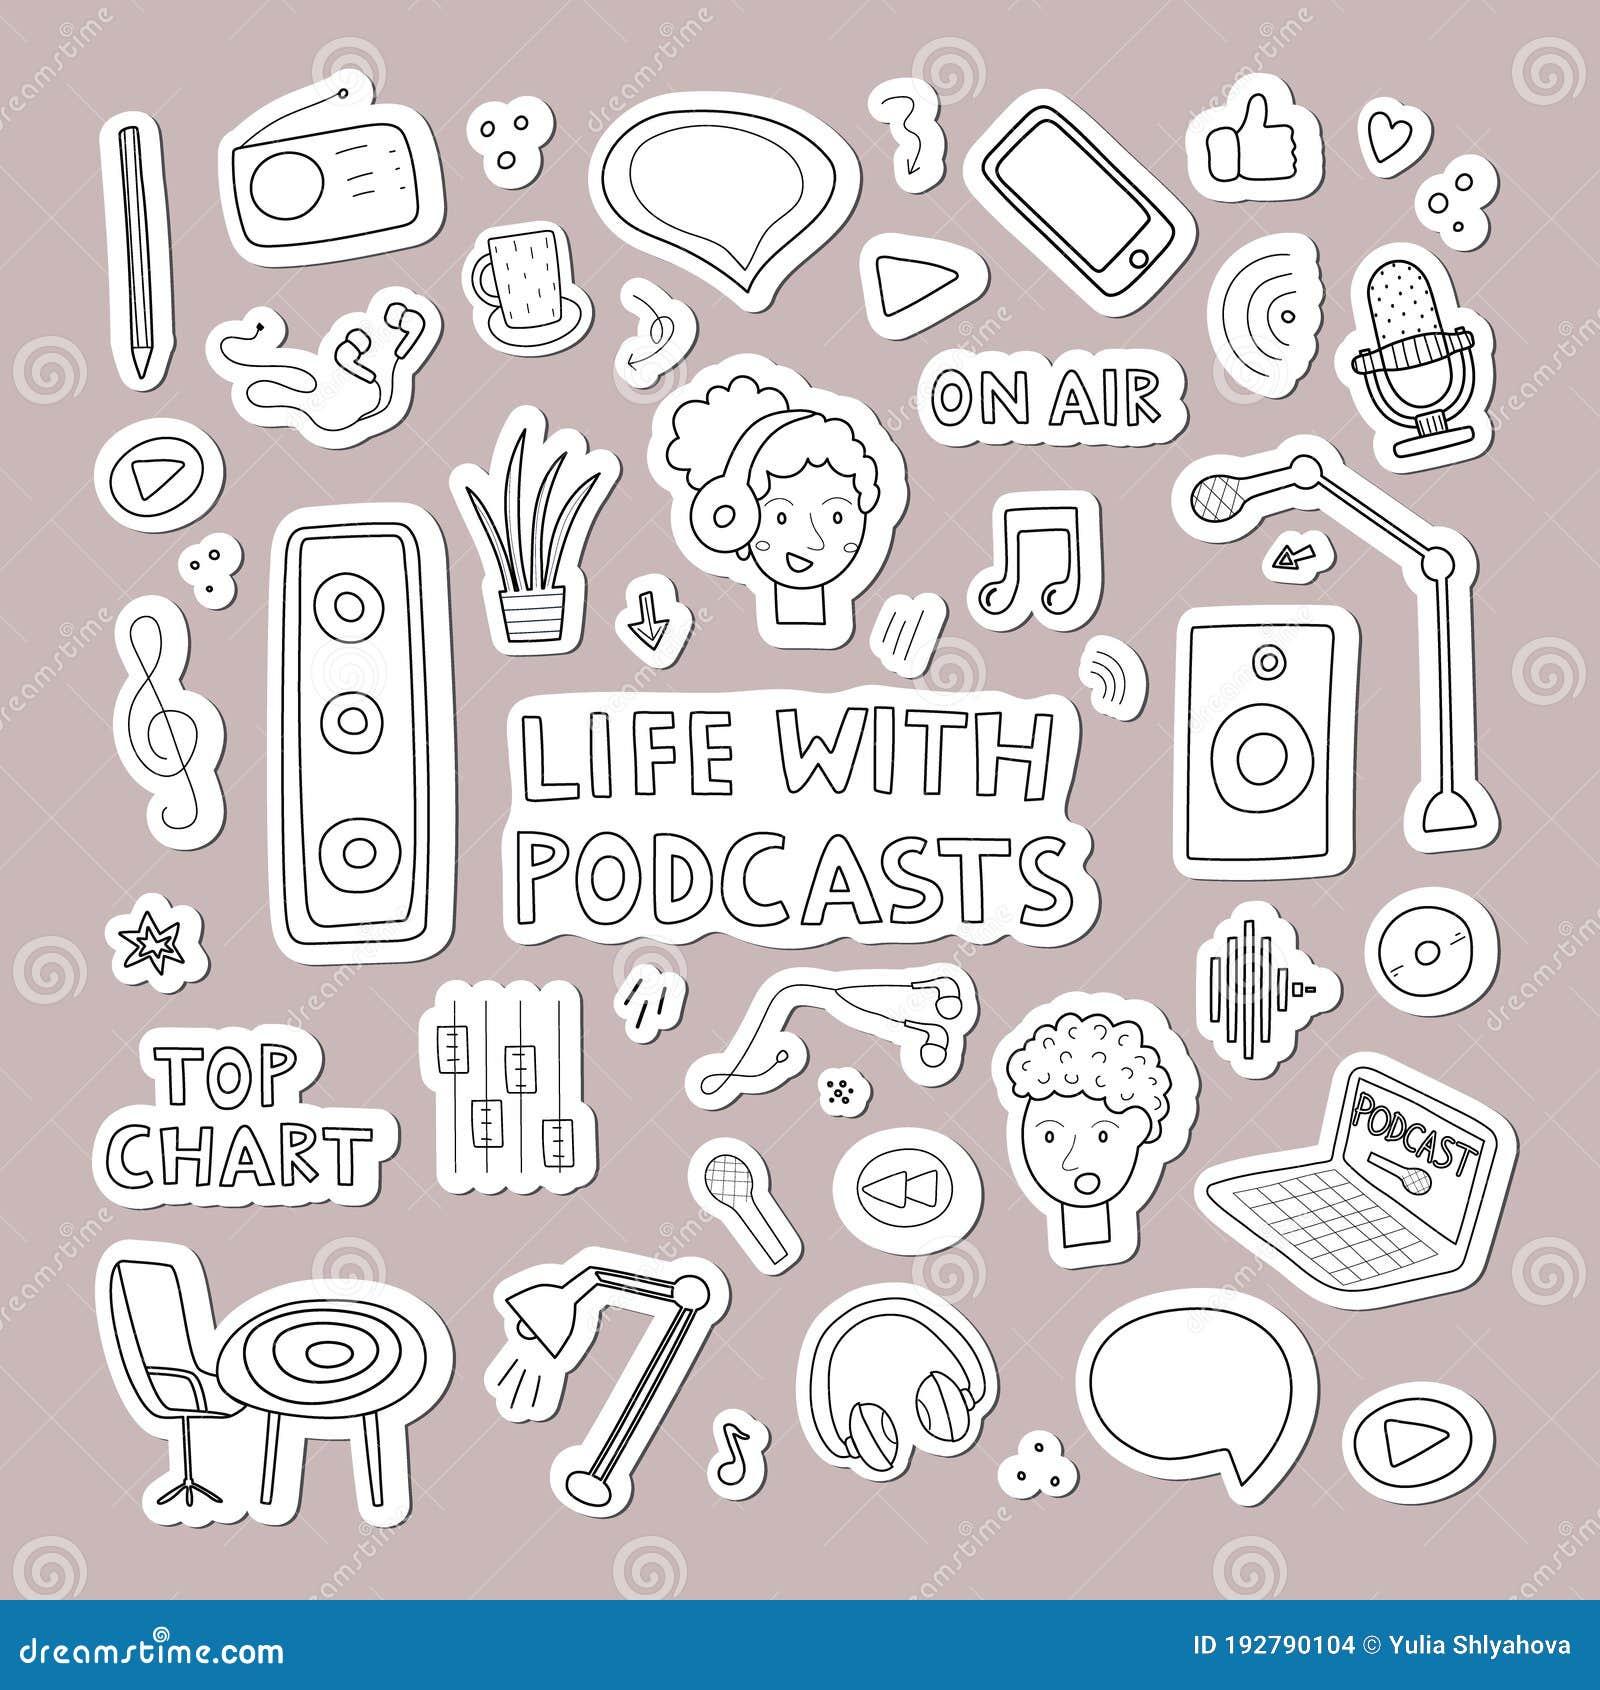 Electrician Clip Art Stock Illustrations – 241 Electrician Clip Art Stock  Illustrations, Vectors & Clipart - Dreamstime